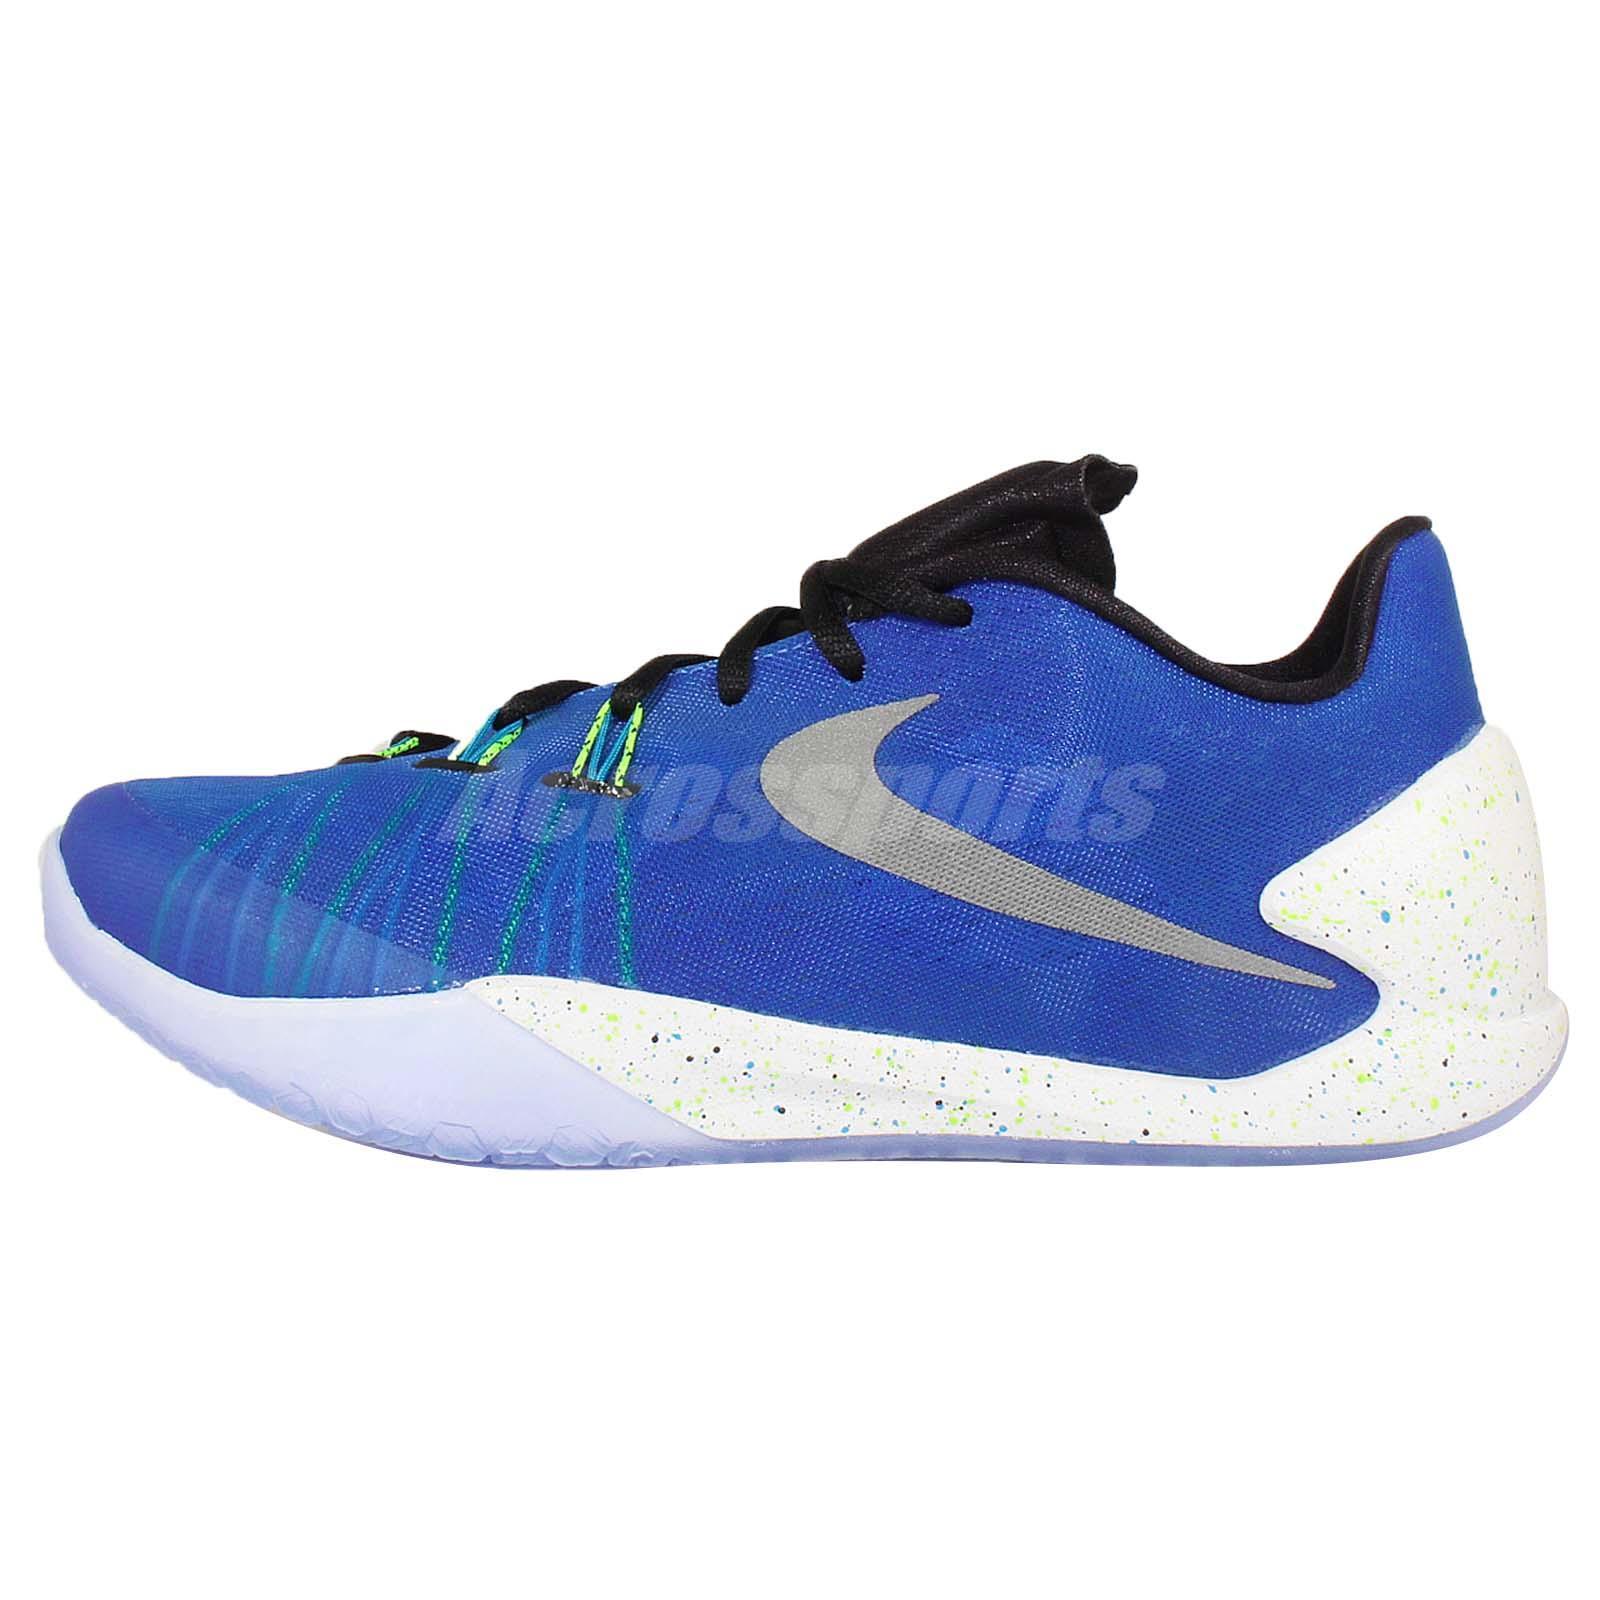 James Harden Nike Shoes: Nike Hyperchase PRM EP James Harden Blue White Mens